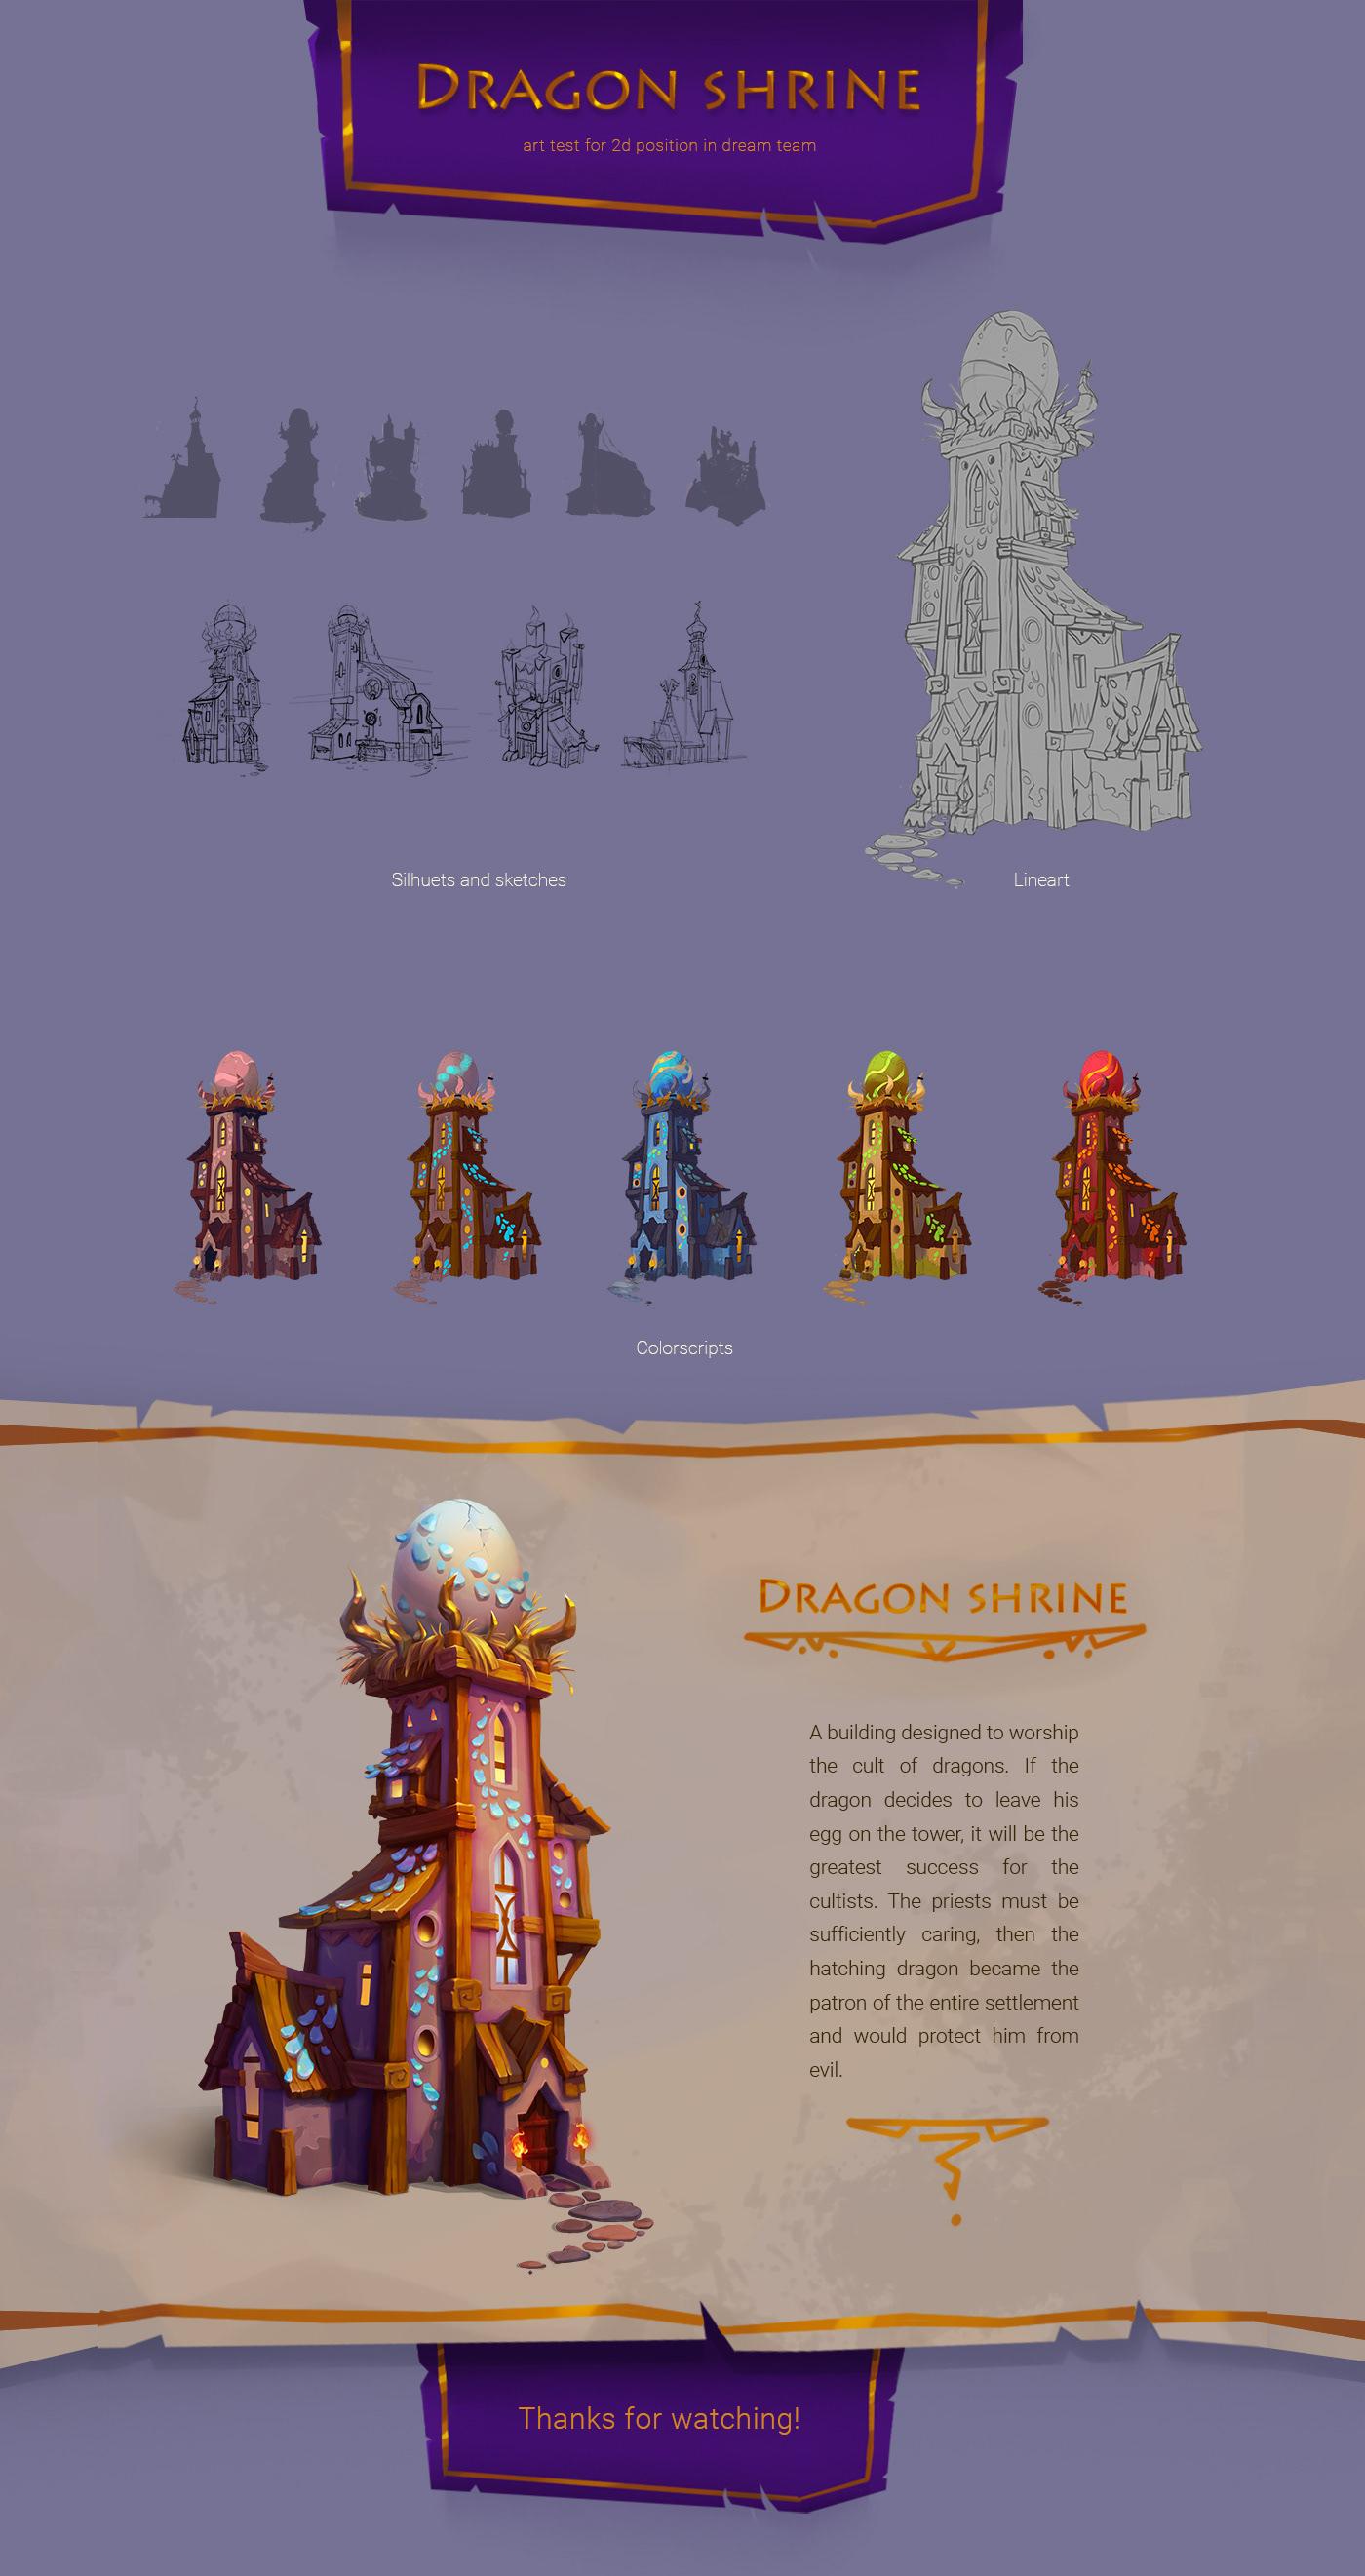 Dragon shrine on Behance